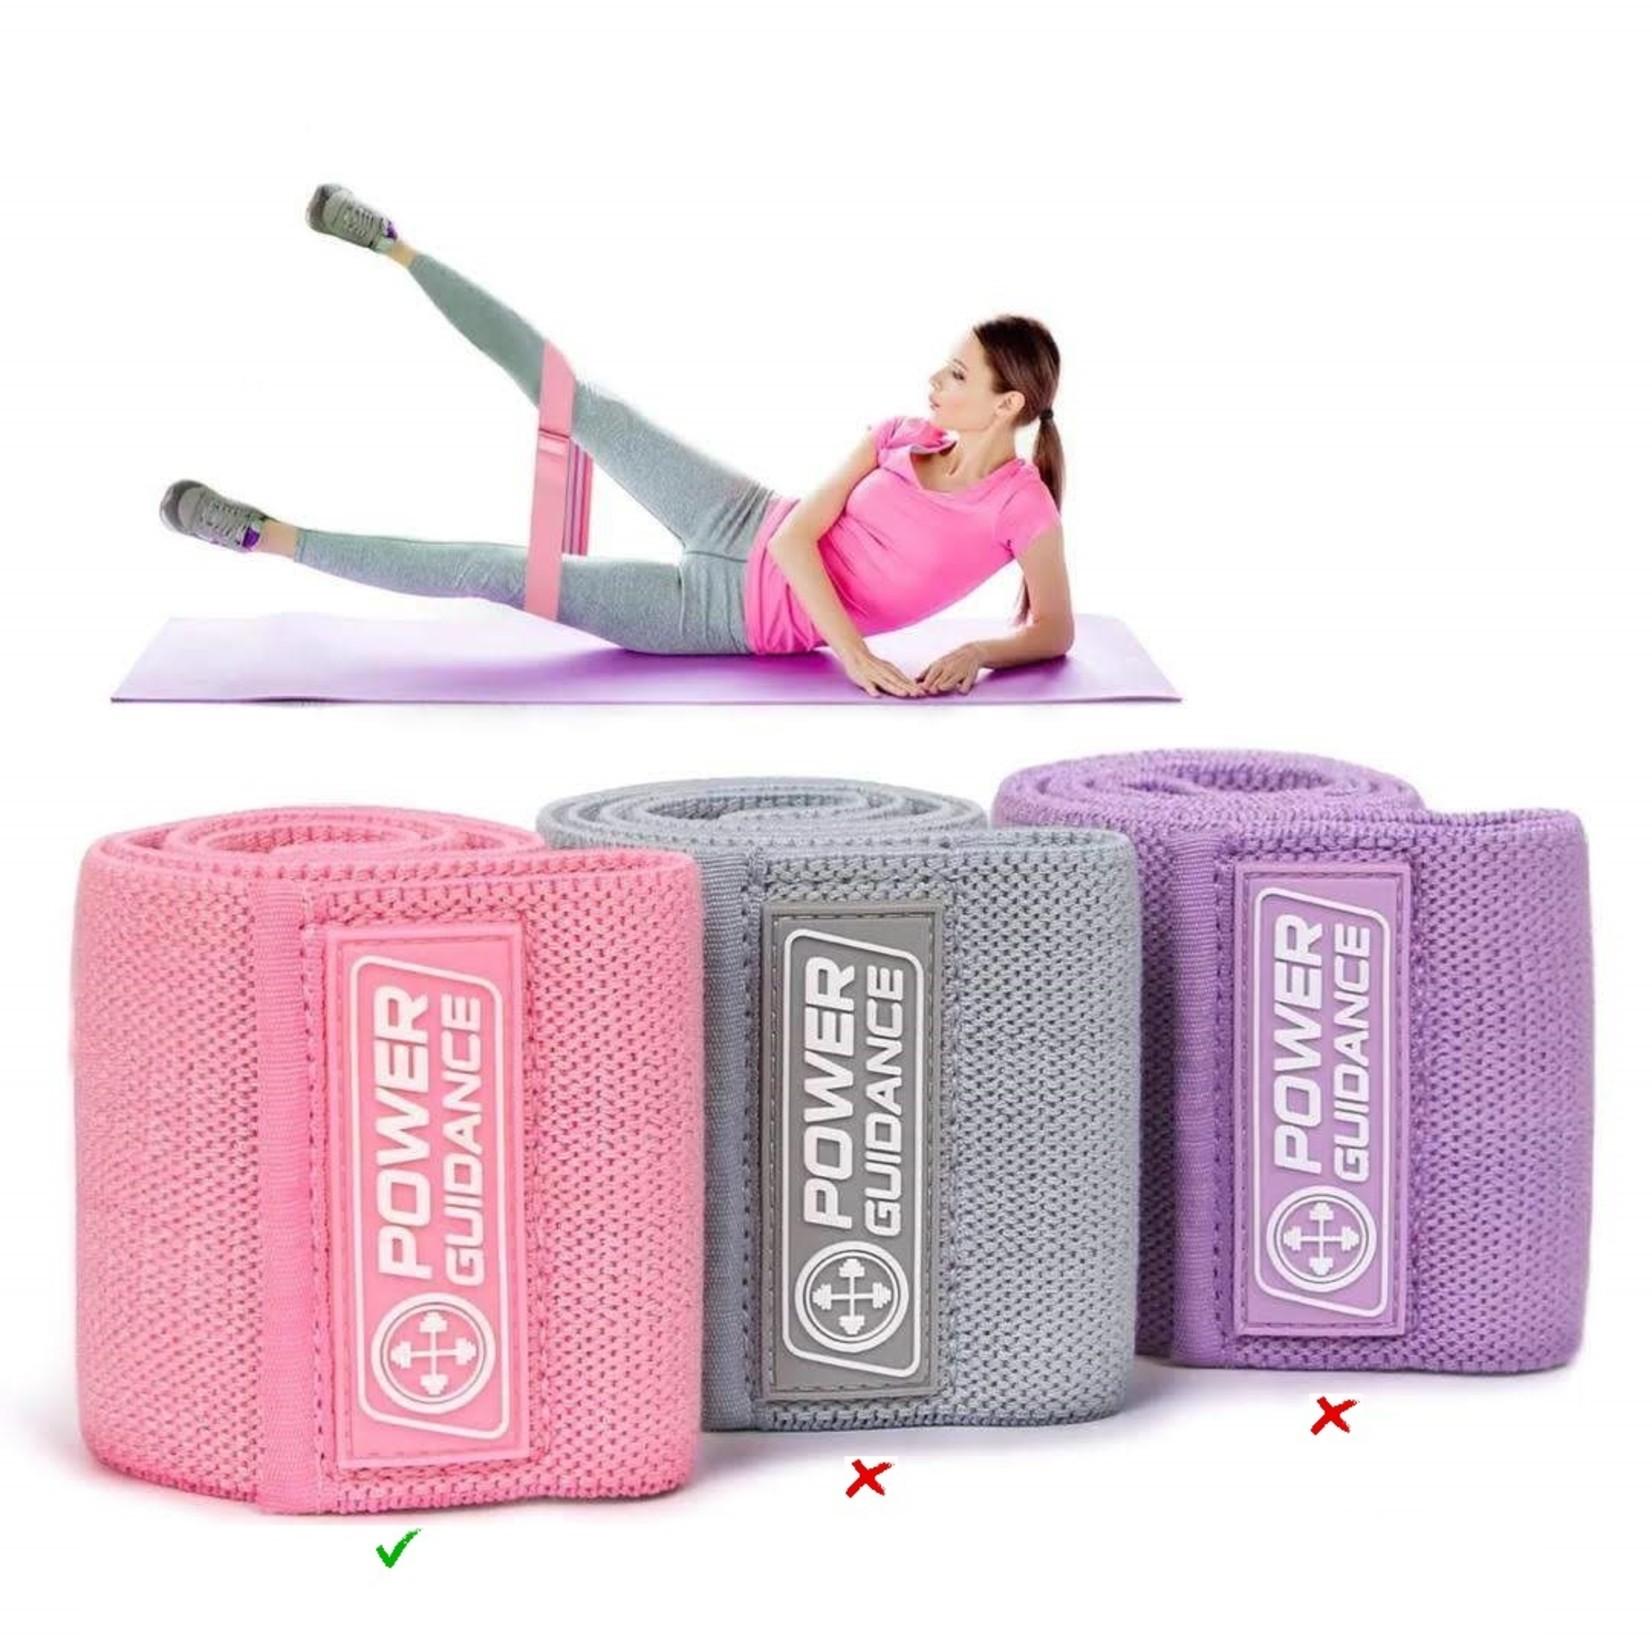 Jobber Fitness Weerstandsband Power Guidance roze 32 cm